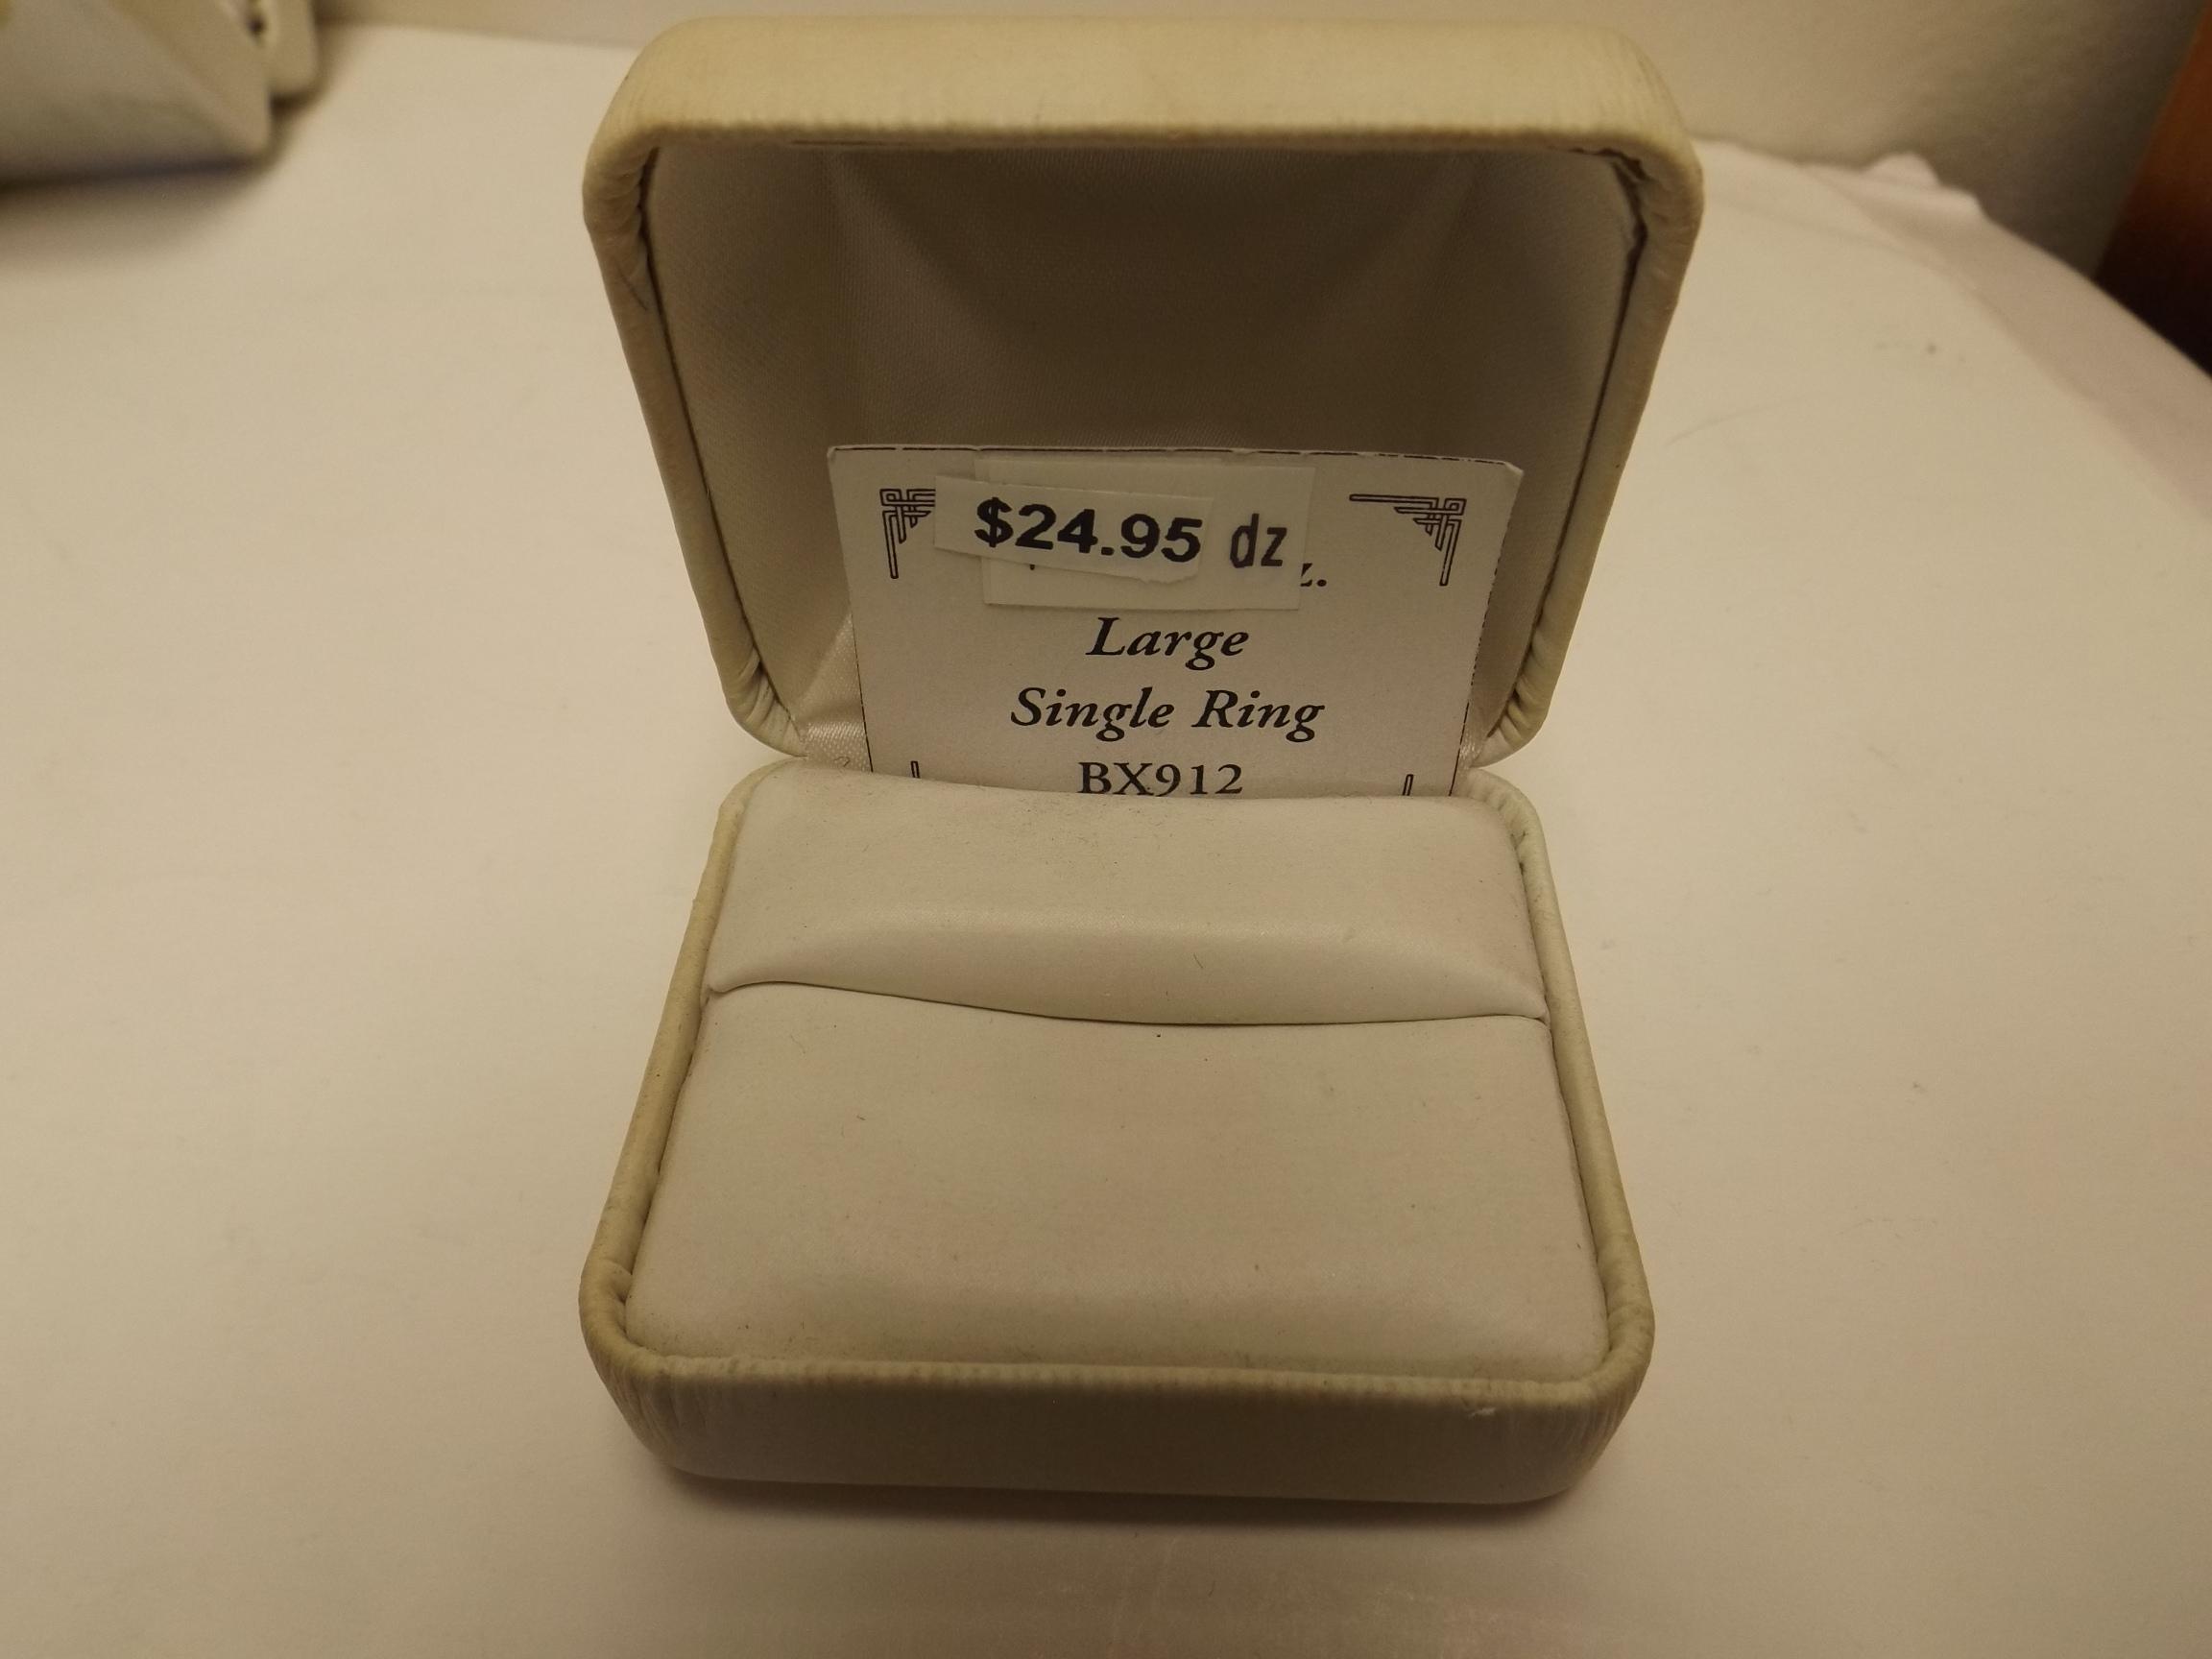 BX912 White Leatherette Large Single Ring Boxes